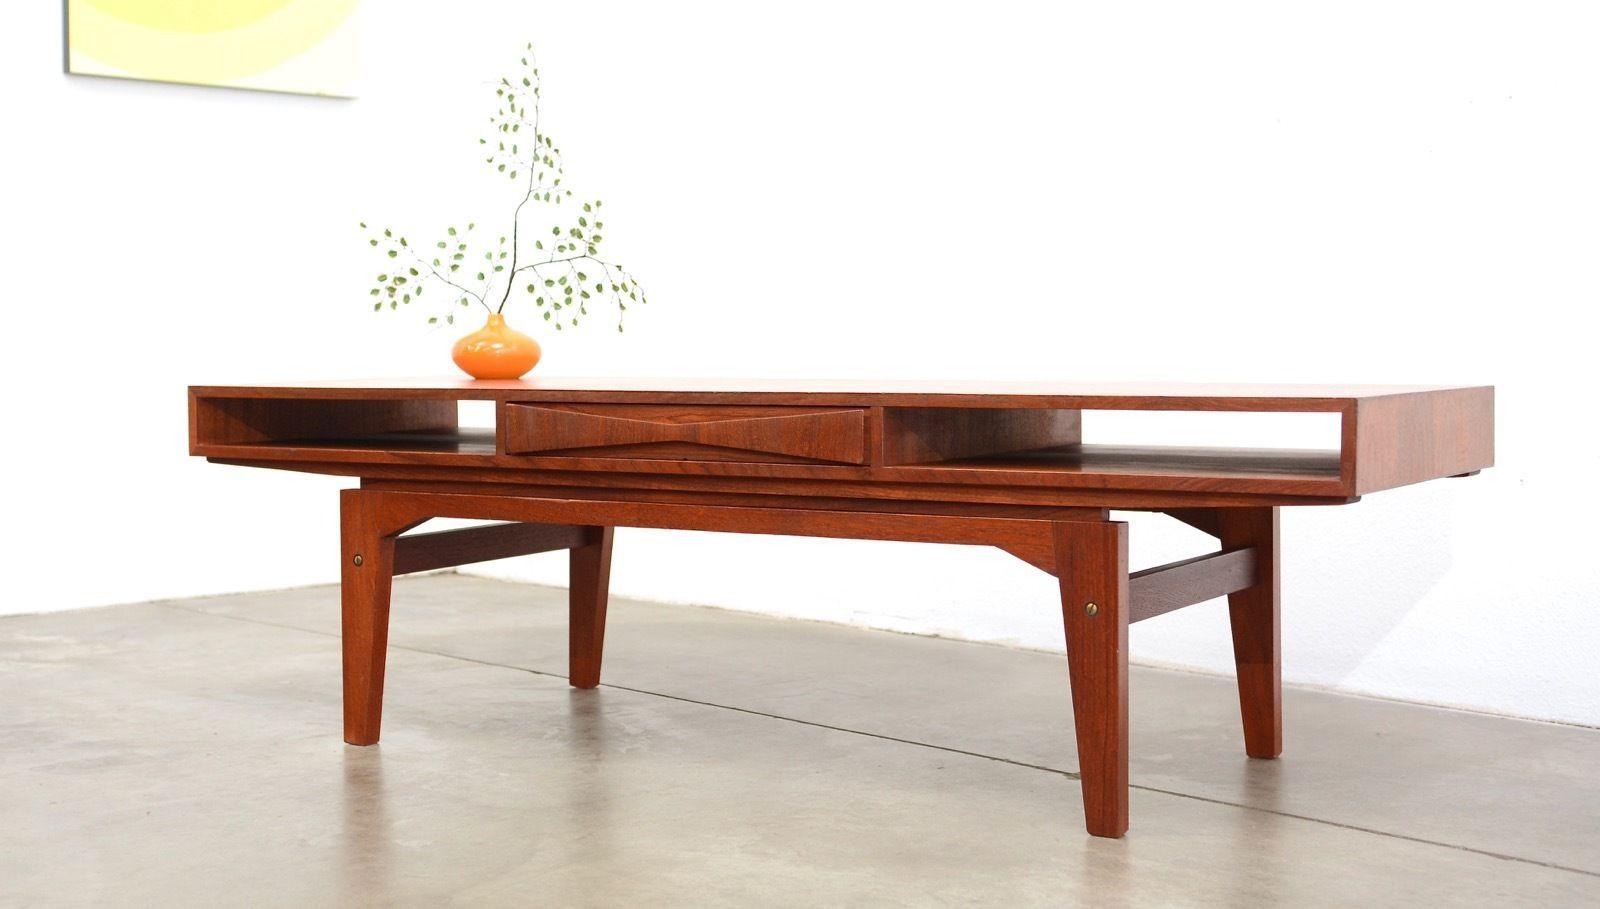 1960s Danish Modern Ew Bach Teak Coffee Table Mid Century Vintage Eames Mid Century Coffee Table Teak Coffee Table Vintage Eames [ 909 x 1600 Pixel ]